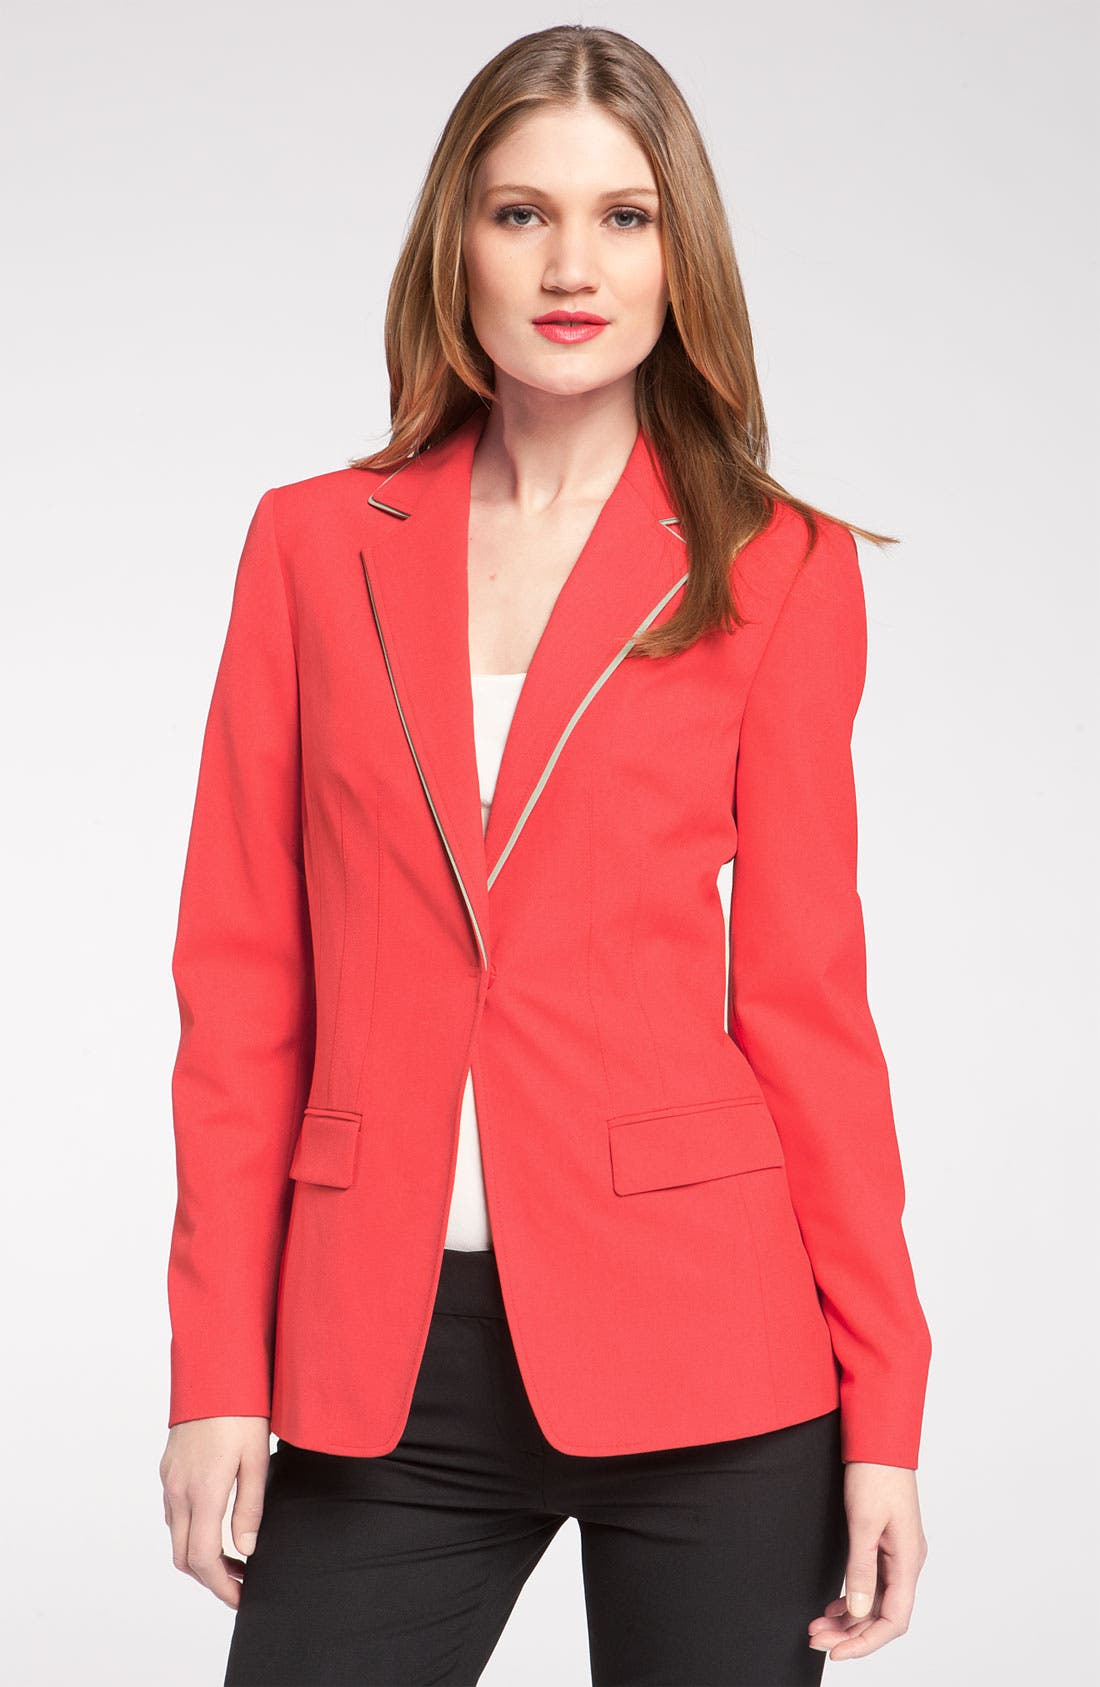 Main Image - Elie Tahari Exclusive for Nordstrom 'Melissa' Contrast Trim Jacket (Nordstrom Exclusive)